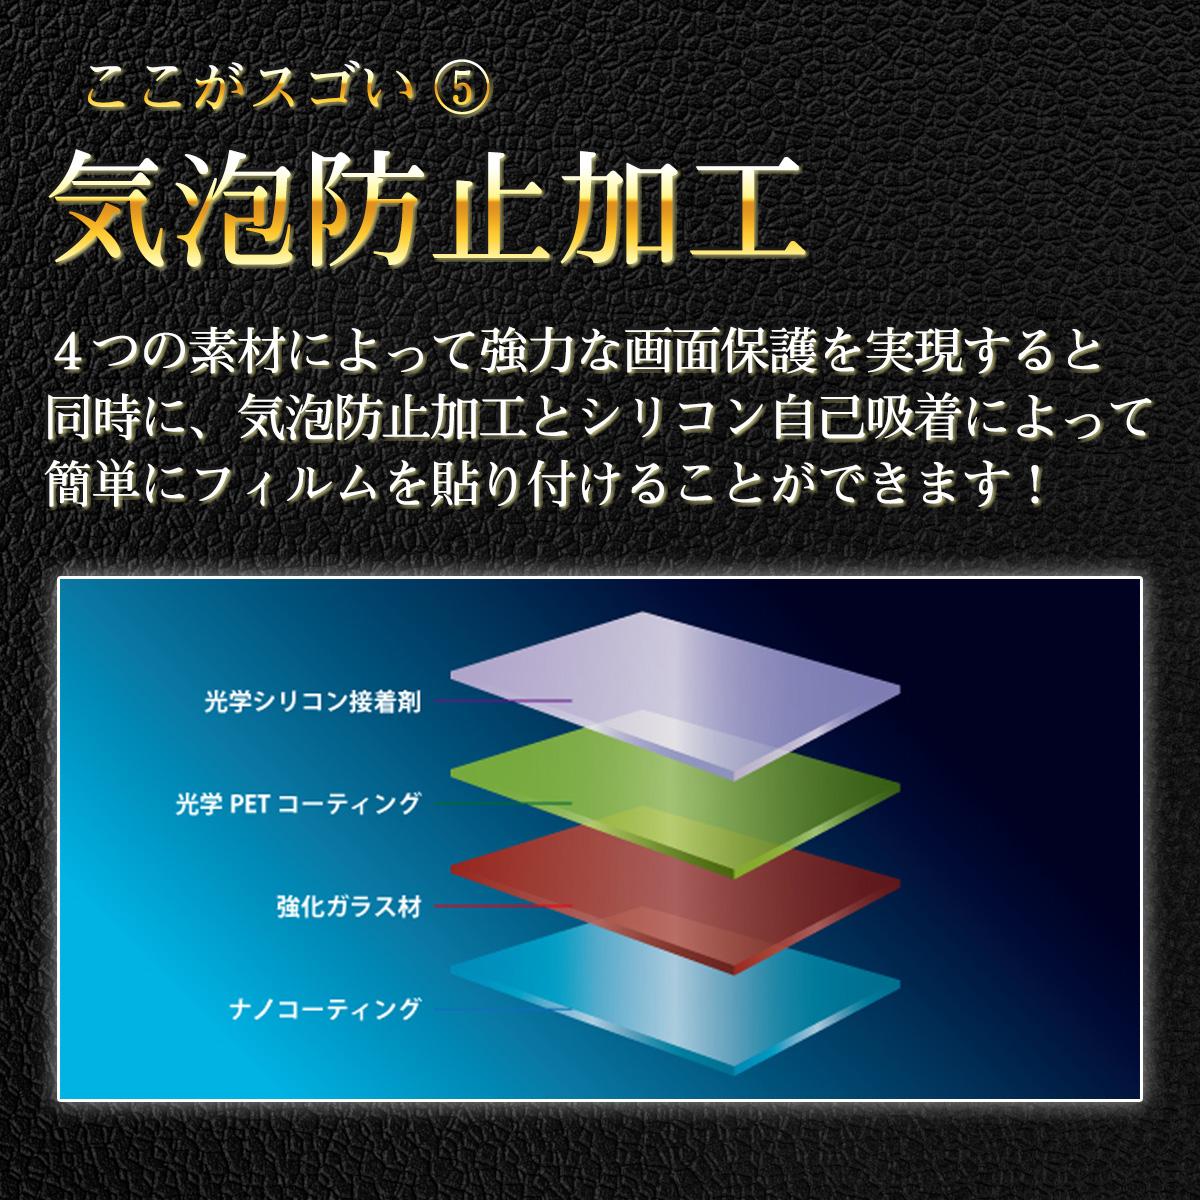 Xperia Z5 SO-01H/SOV32/501SO スマホ ブルーライト強化ガラスフィルム 強化ガラス保護フィルム 液晶保護 画面保護 エクスペリア SONY ソニー